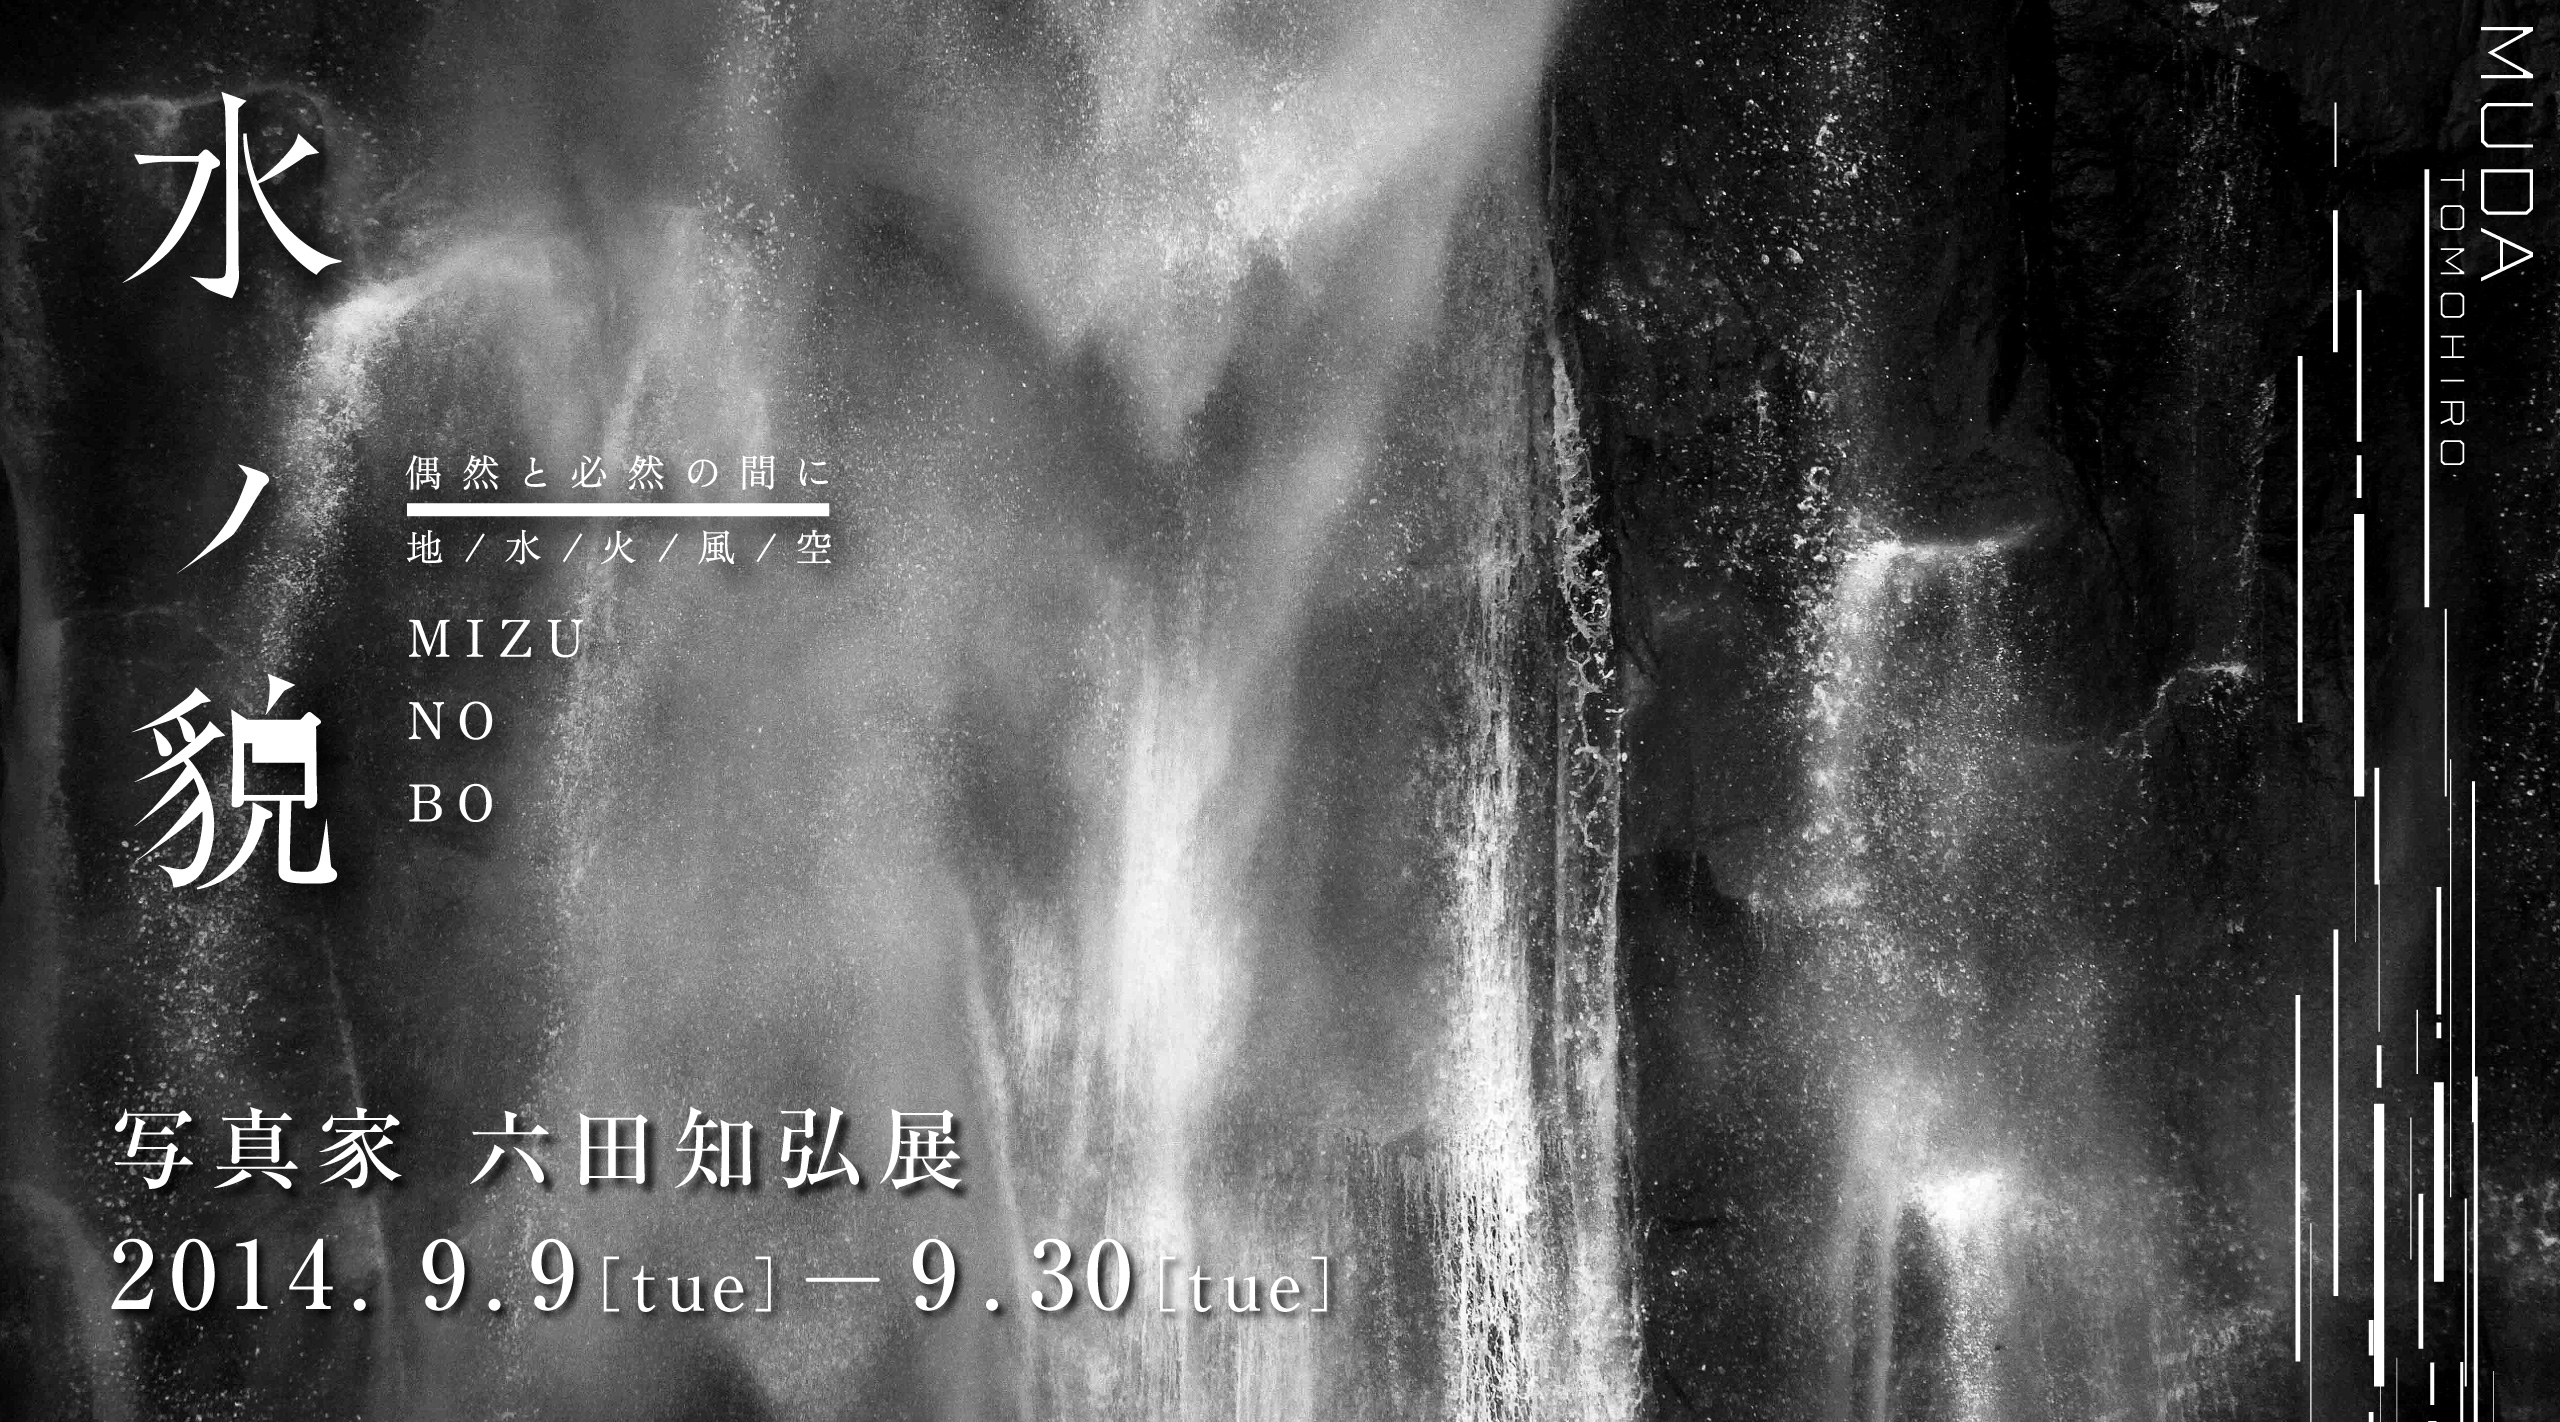 写真家 六田知弘展「水ノ貌 MIZU NO BO」偶然と必然の間に・地/水/火/風/空